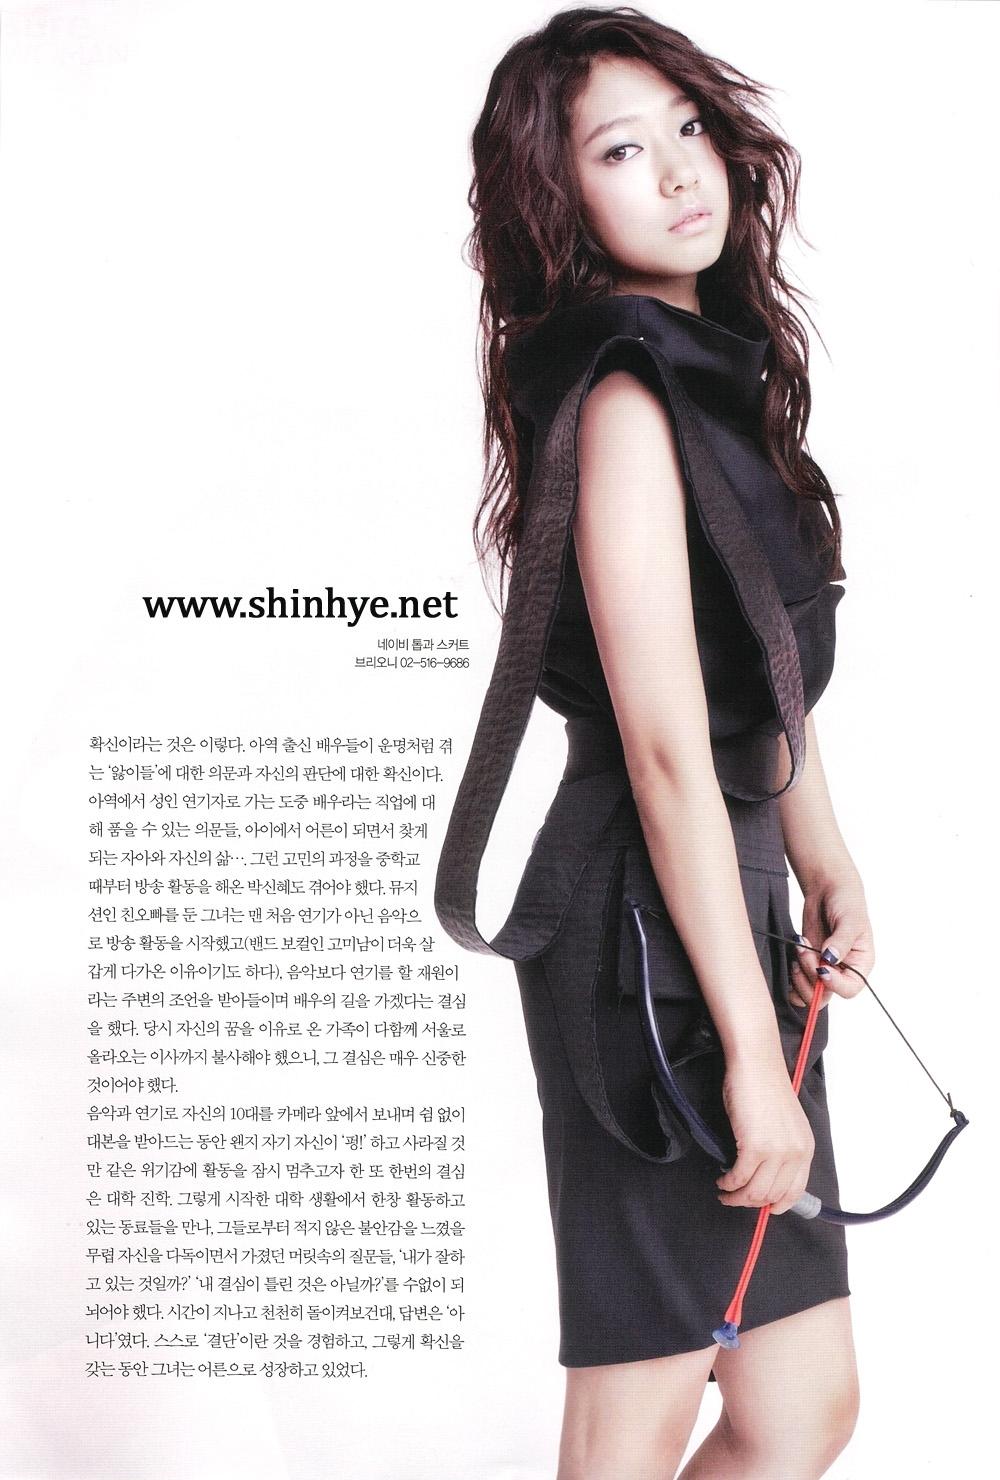 Park Shin Hye - Wallpaper Actress